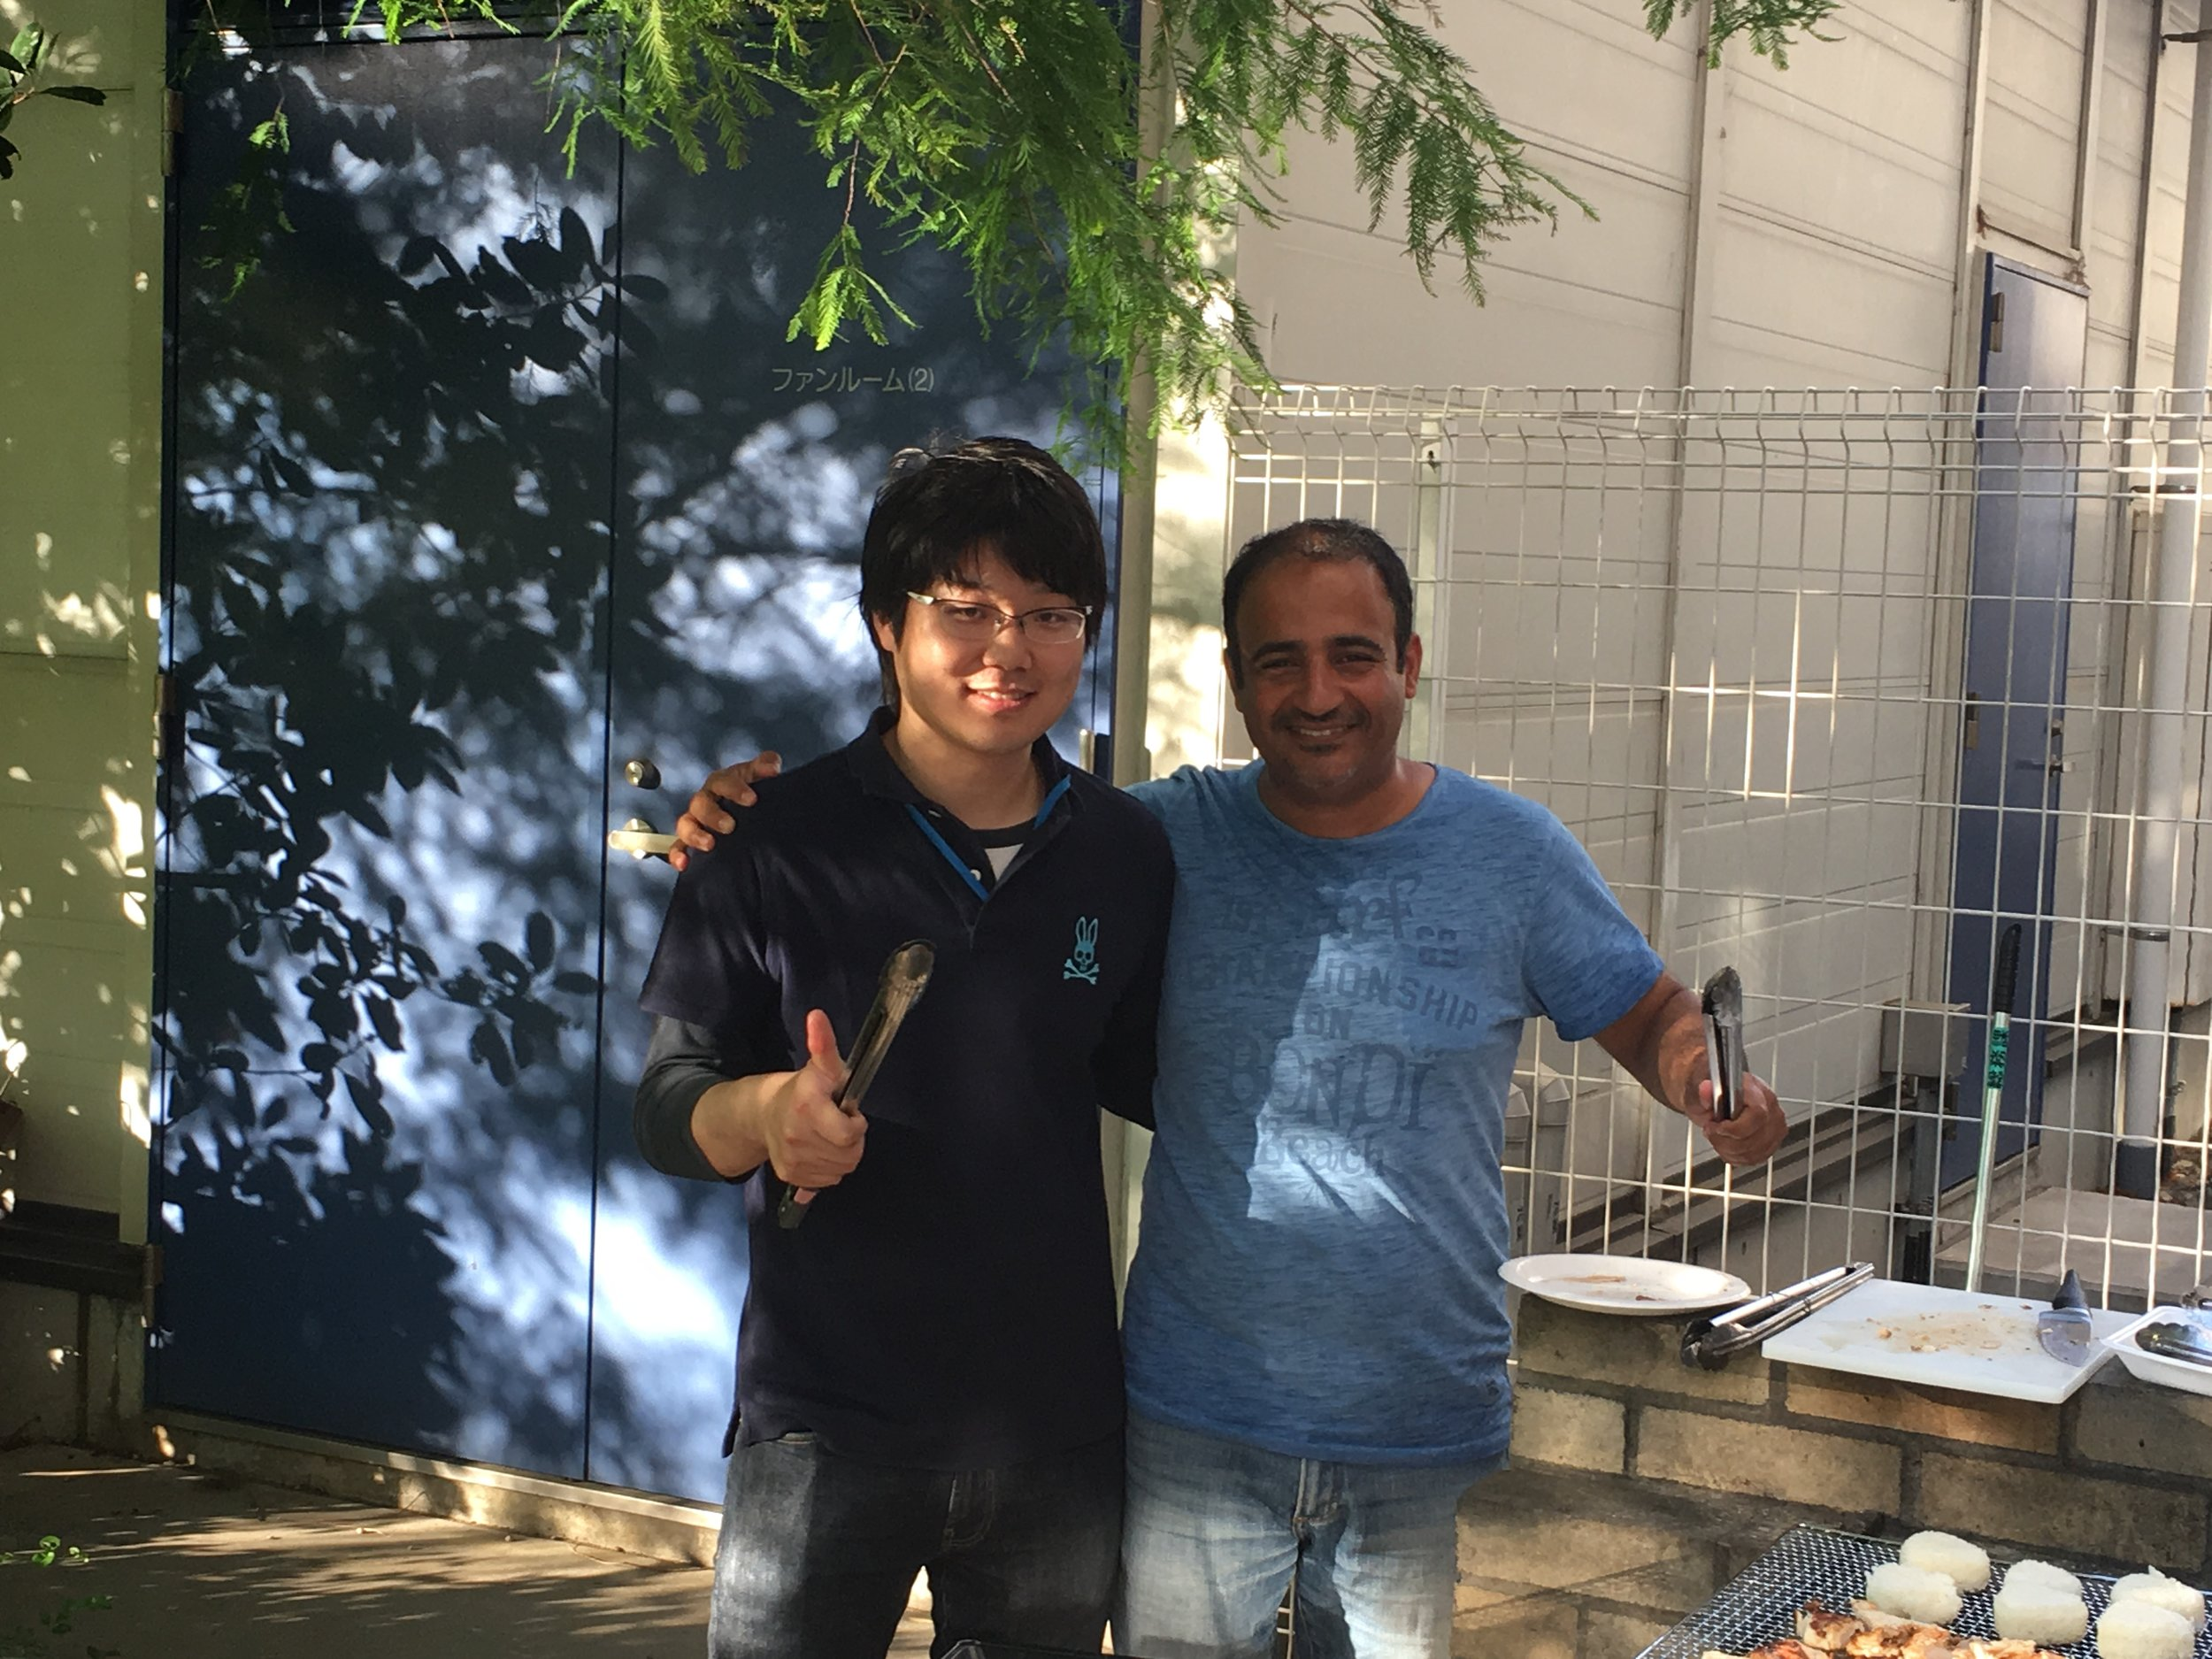 Photo 2017-06-09 17 46 04.jpg